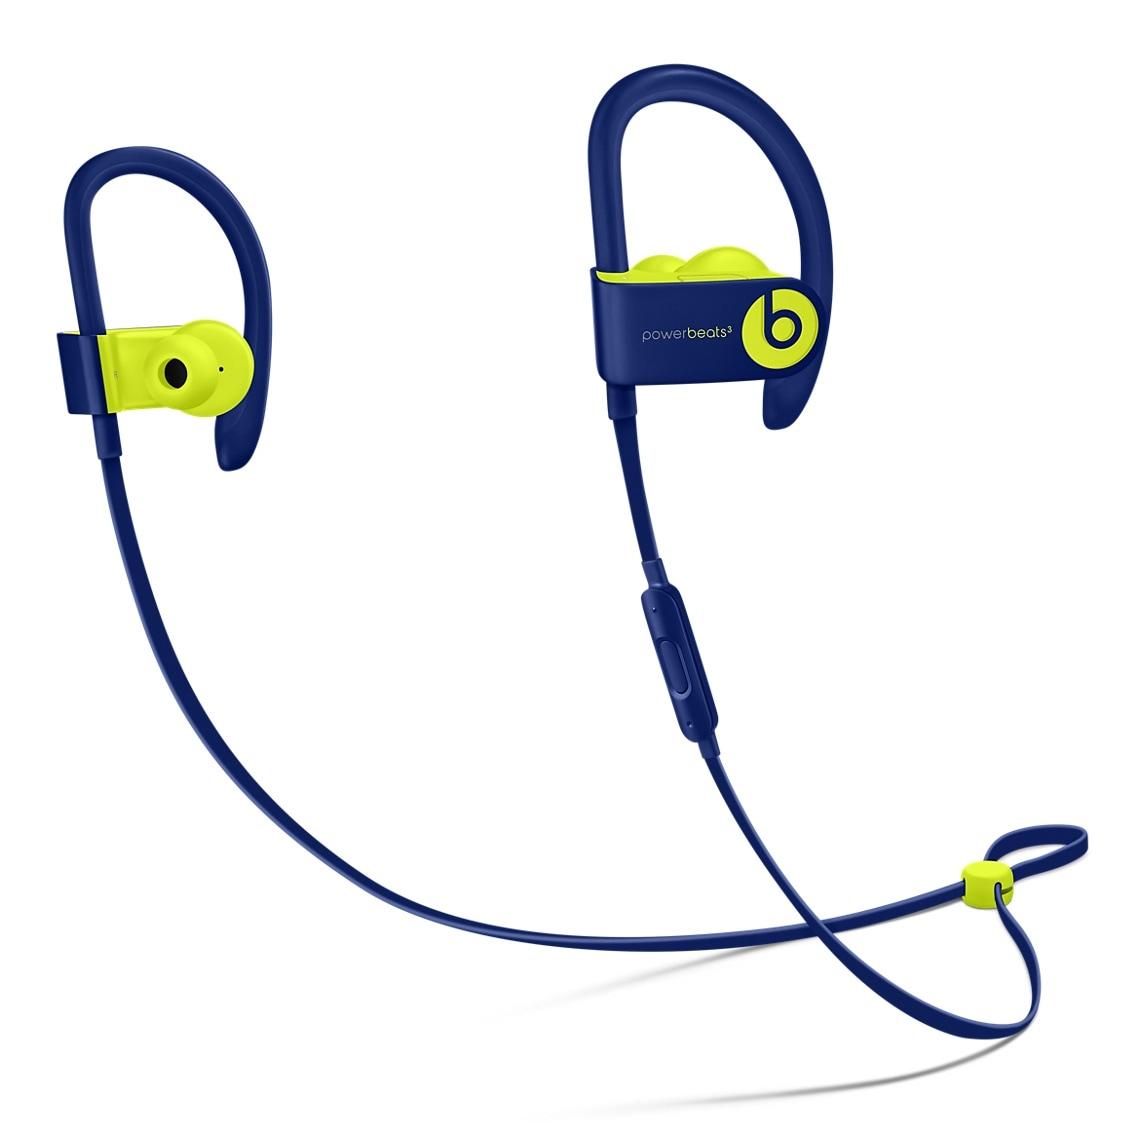 Fones Powerbeats3 Wireless na cor marinho pop